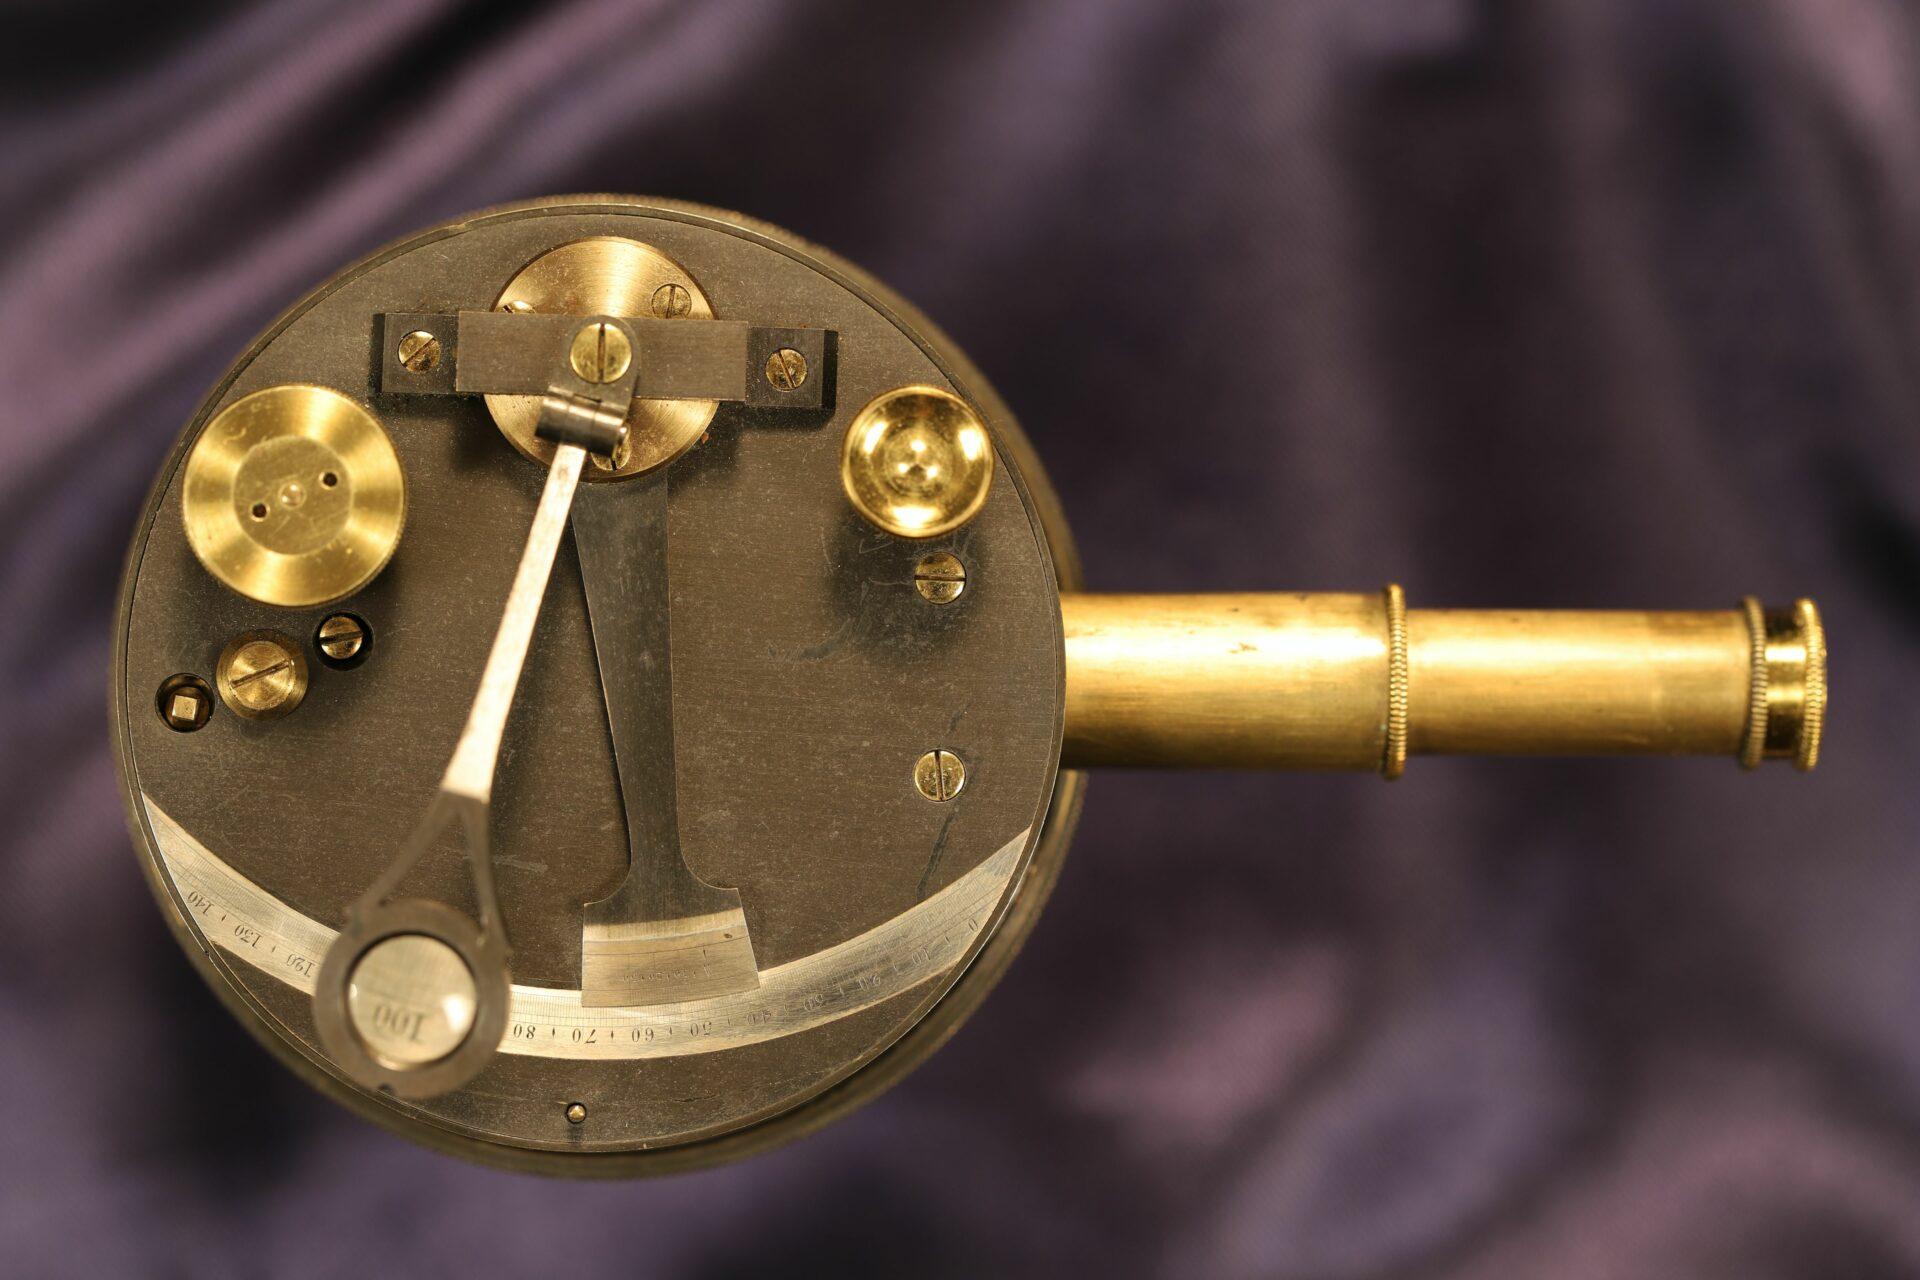 Image of Oxidised Brass Pocket Sextant c1890 showing telescope